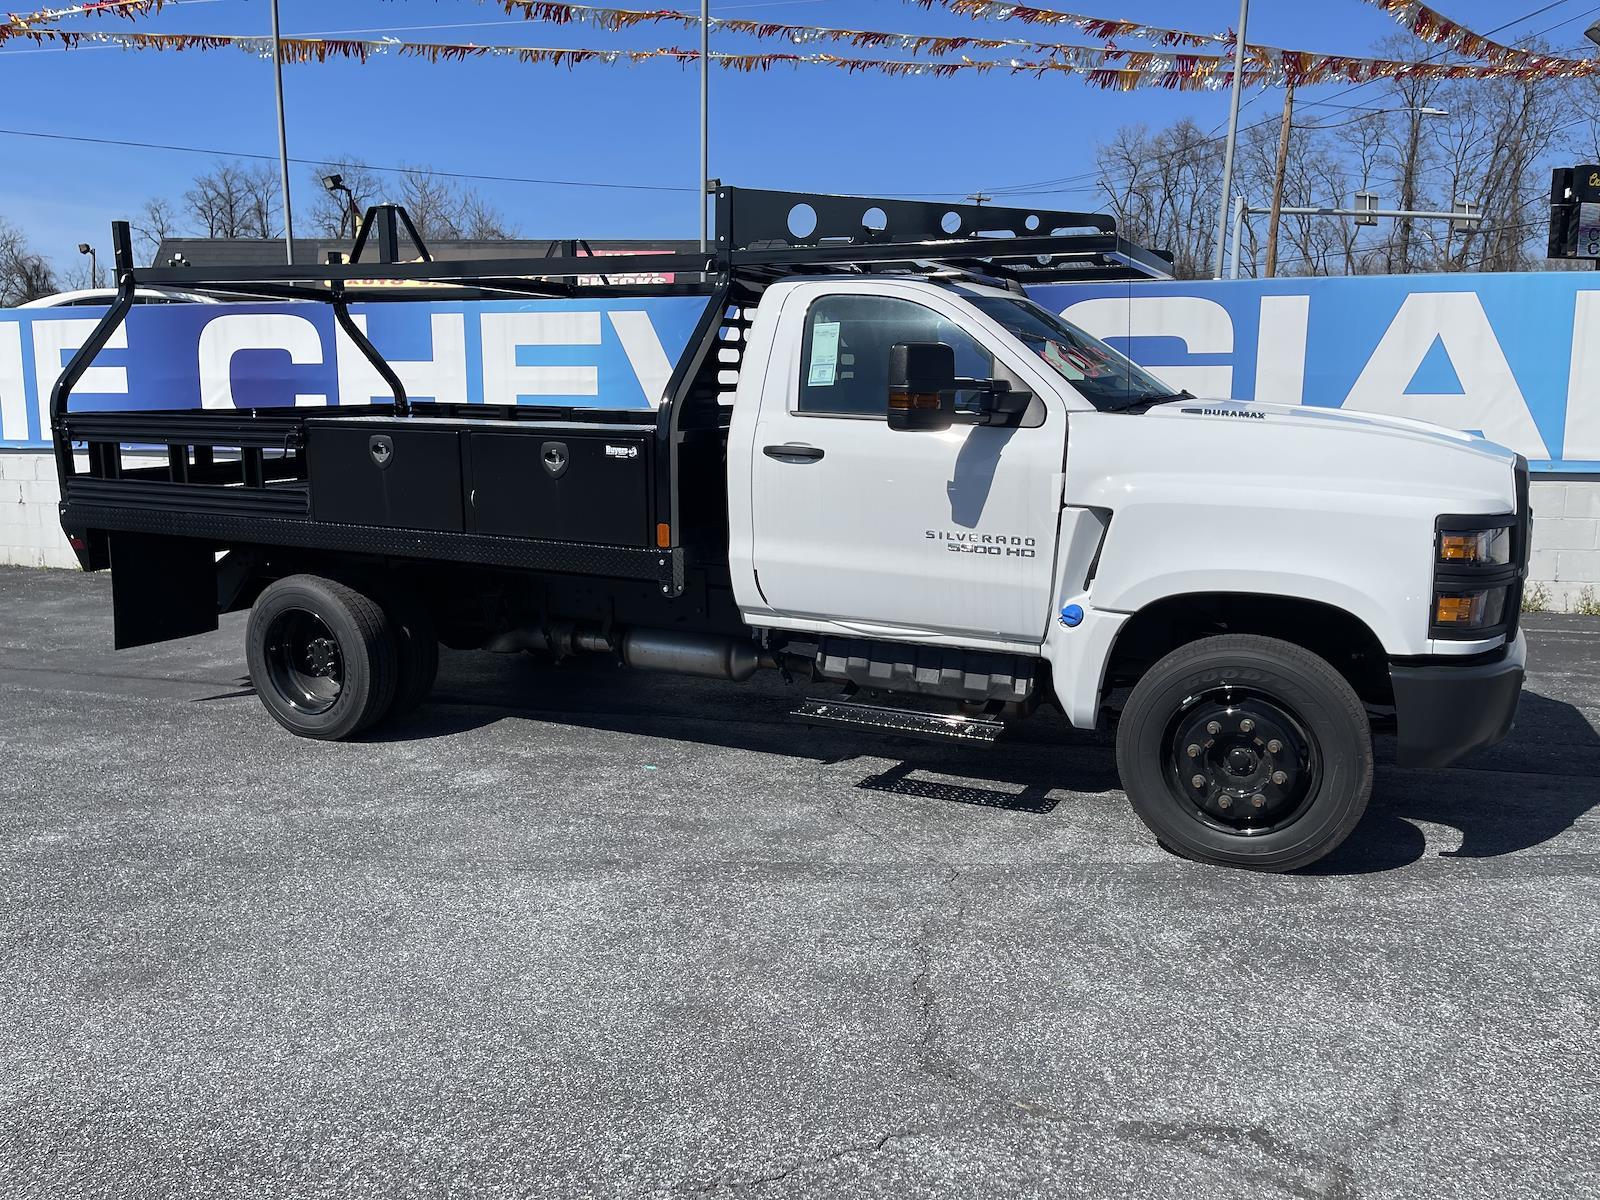 2020 Chevrolet Silverado 4500 Regular Cab DRW 4x2, Mike's Truck Service and Sales Inc. Contractor Body #205978 - photo 10